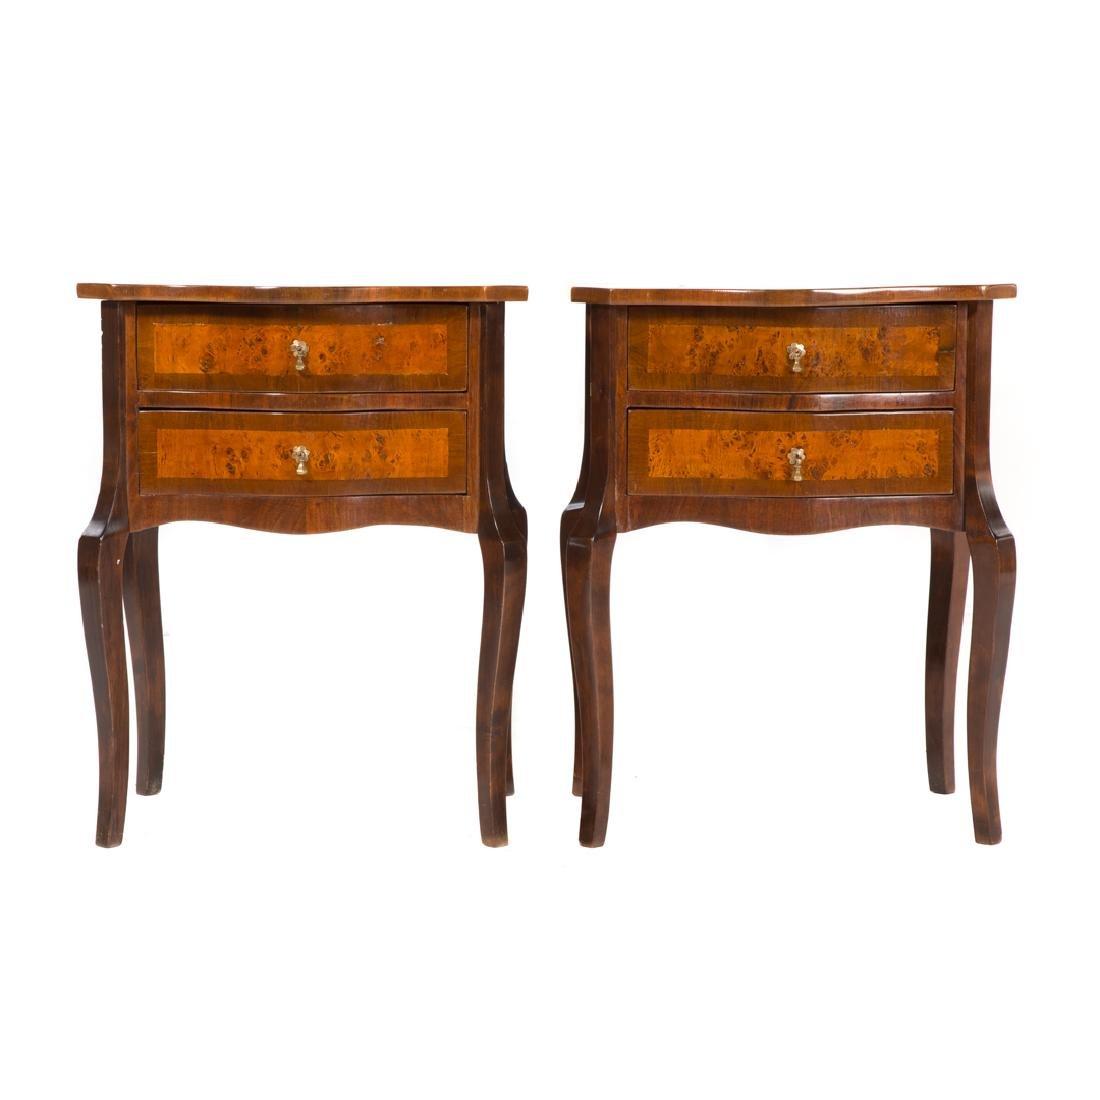 Pair German burl walnut side tables